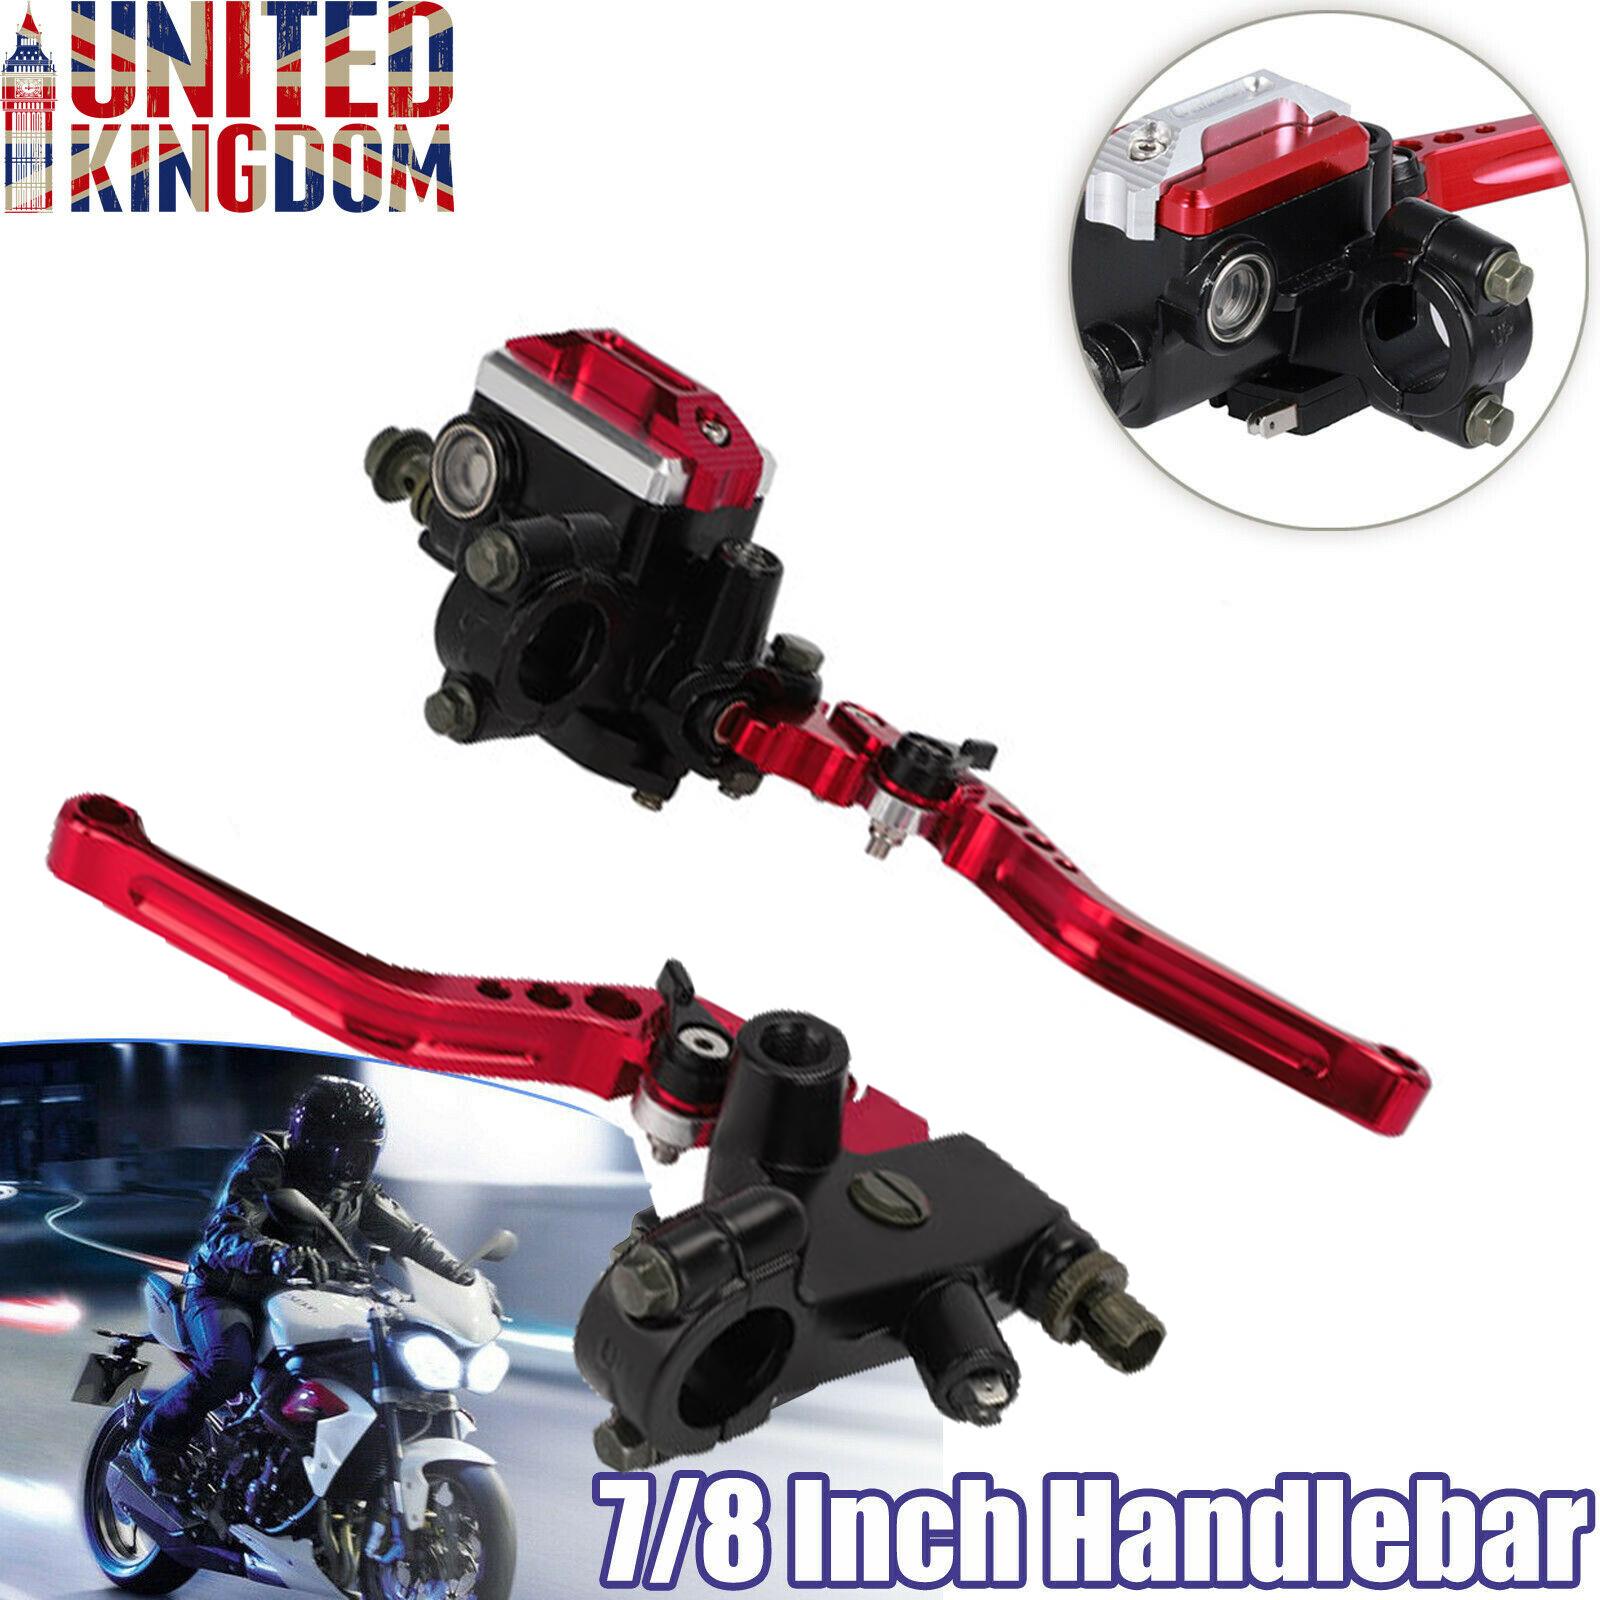 Motorcycle Brake Pump Handles,22mm 7//8 inch CNC Aluminum Hydraulic Cylinder Master Reservoir Lever for Yamaha Honda Suzuki etc Red